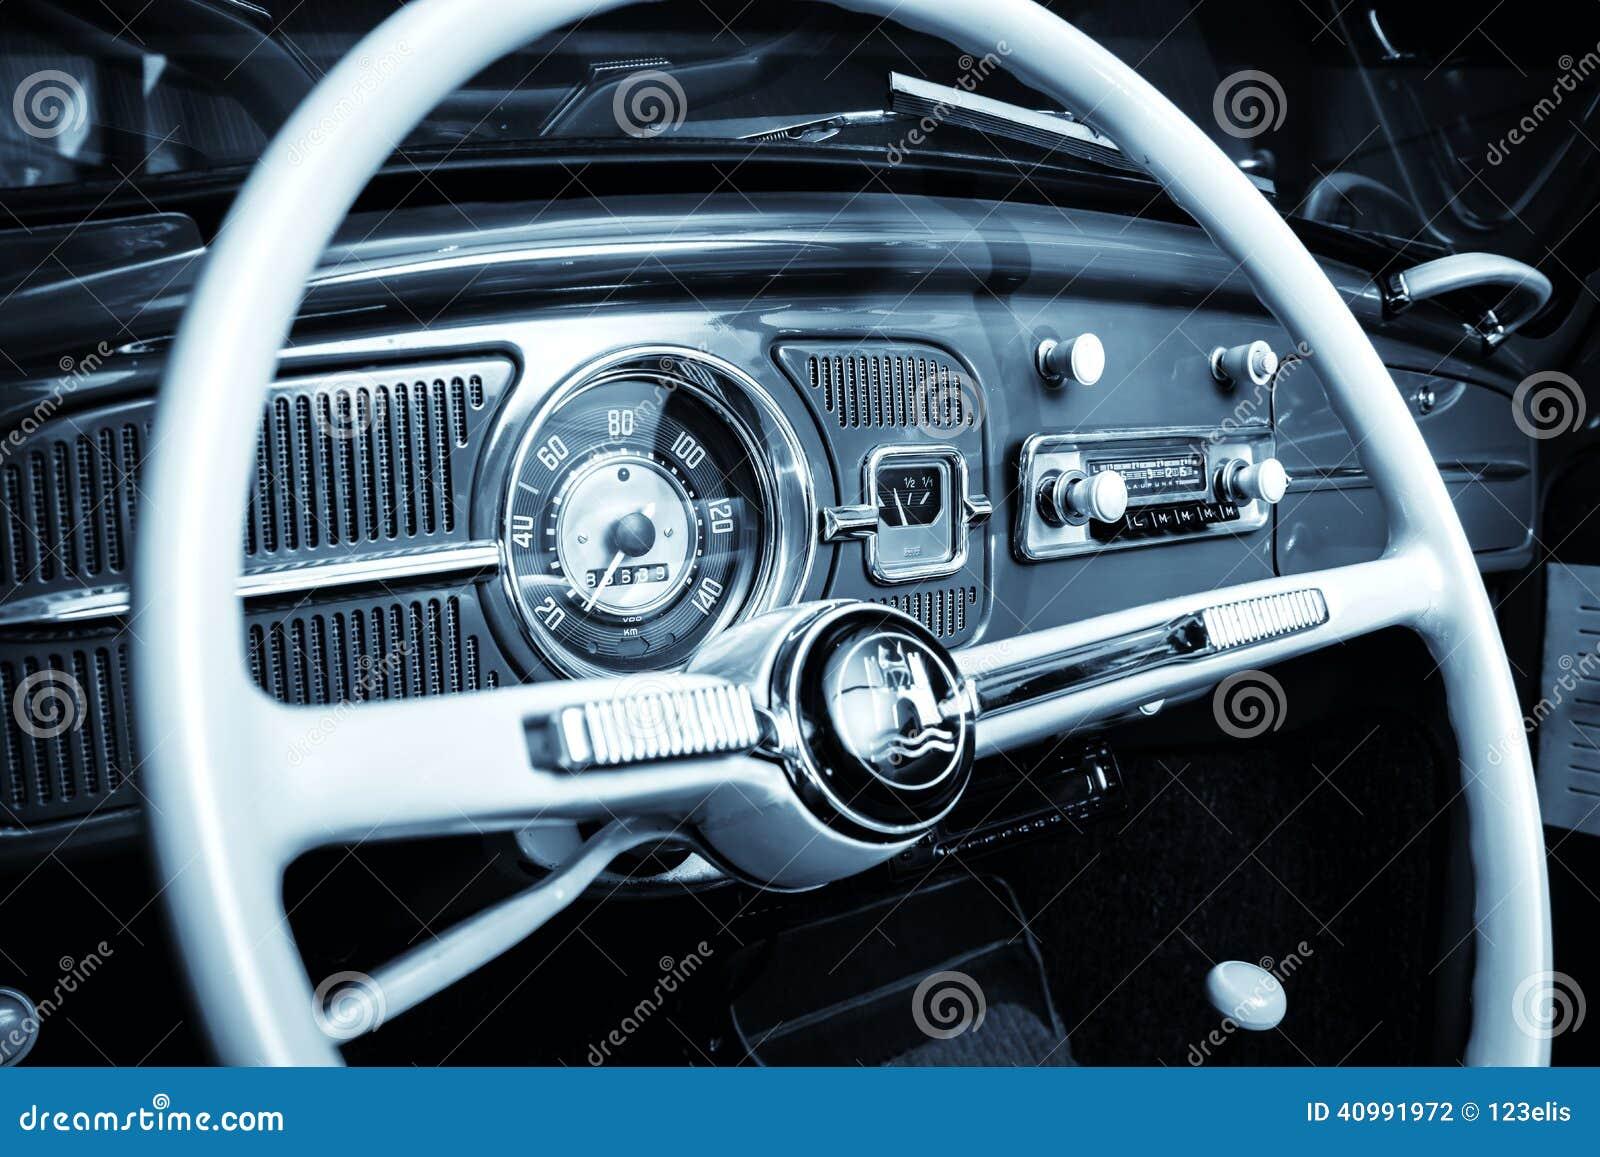 volkswagen steering wheel editorial photo 64257815. Black Bedroom Furniture Sets. Home Design Ideas